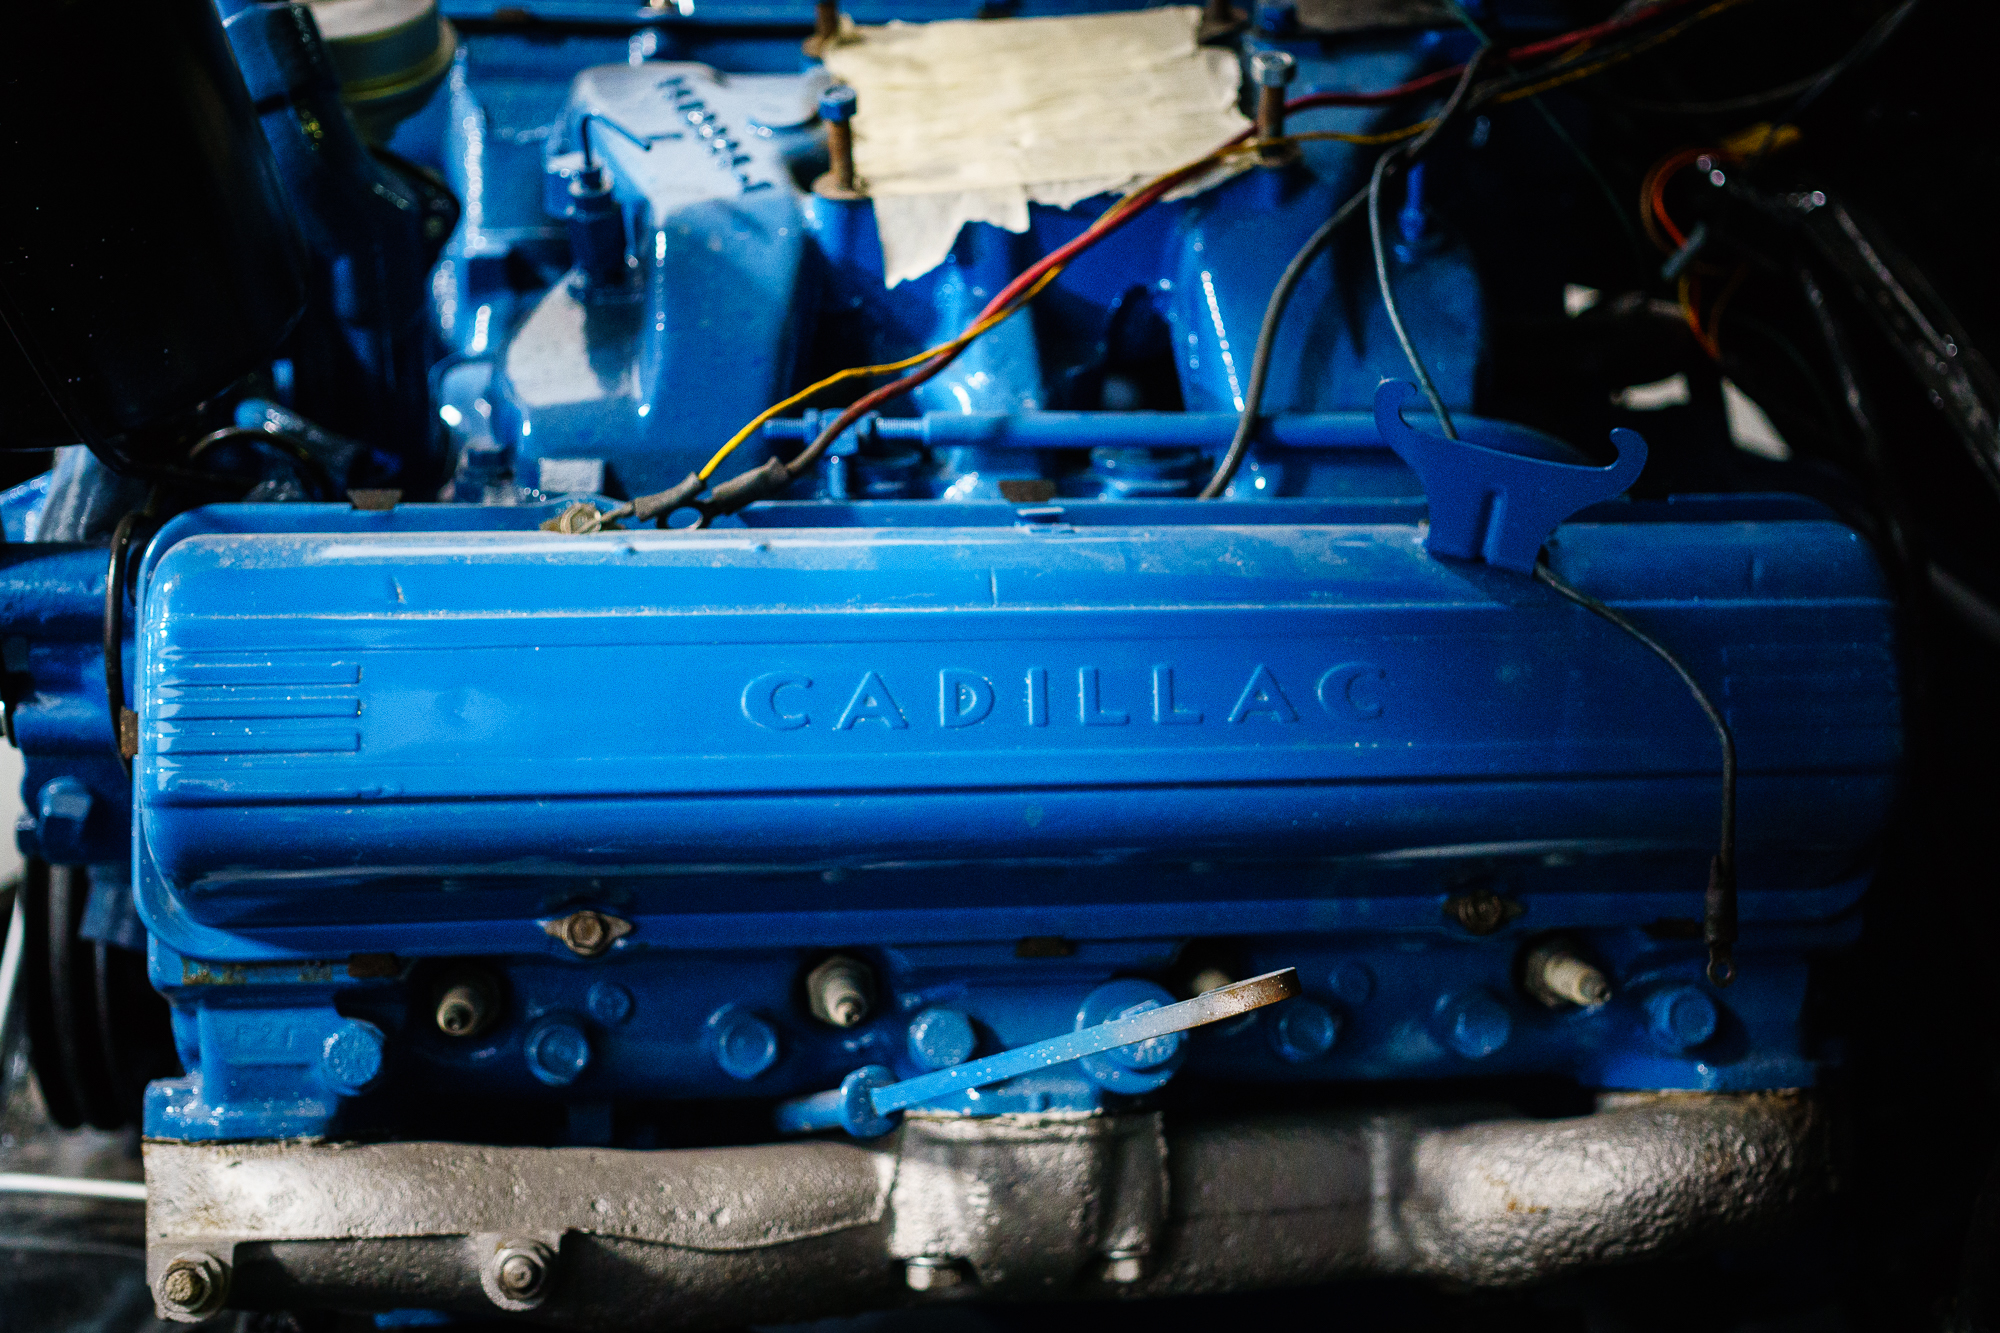 Blue Cadillac V8 motor